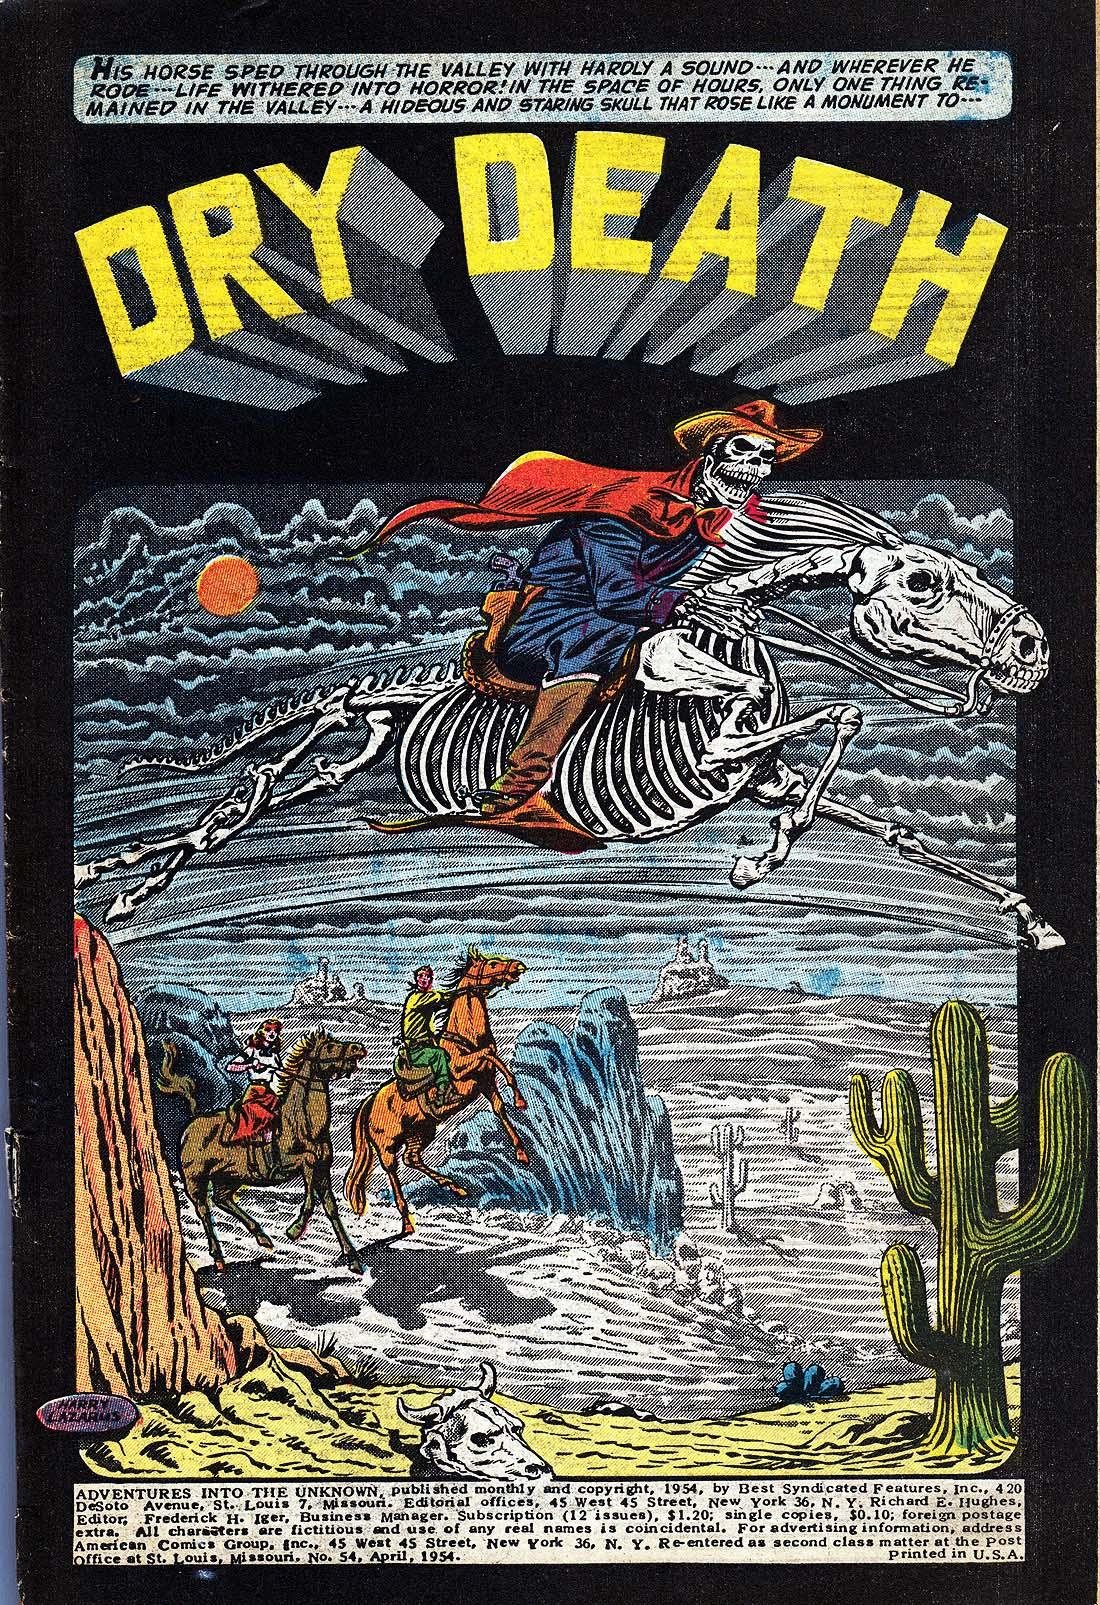 DryDeath1